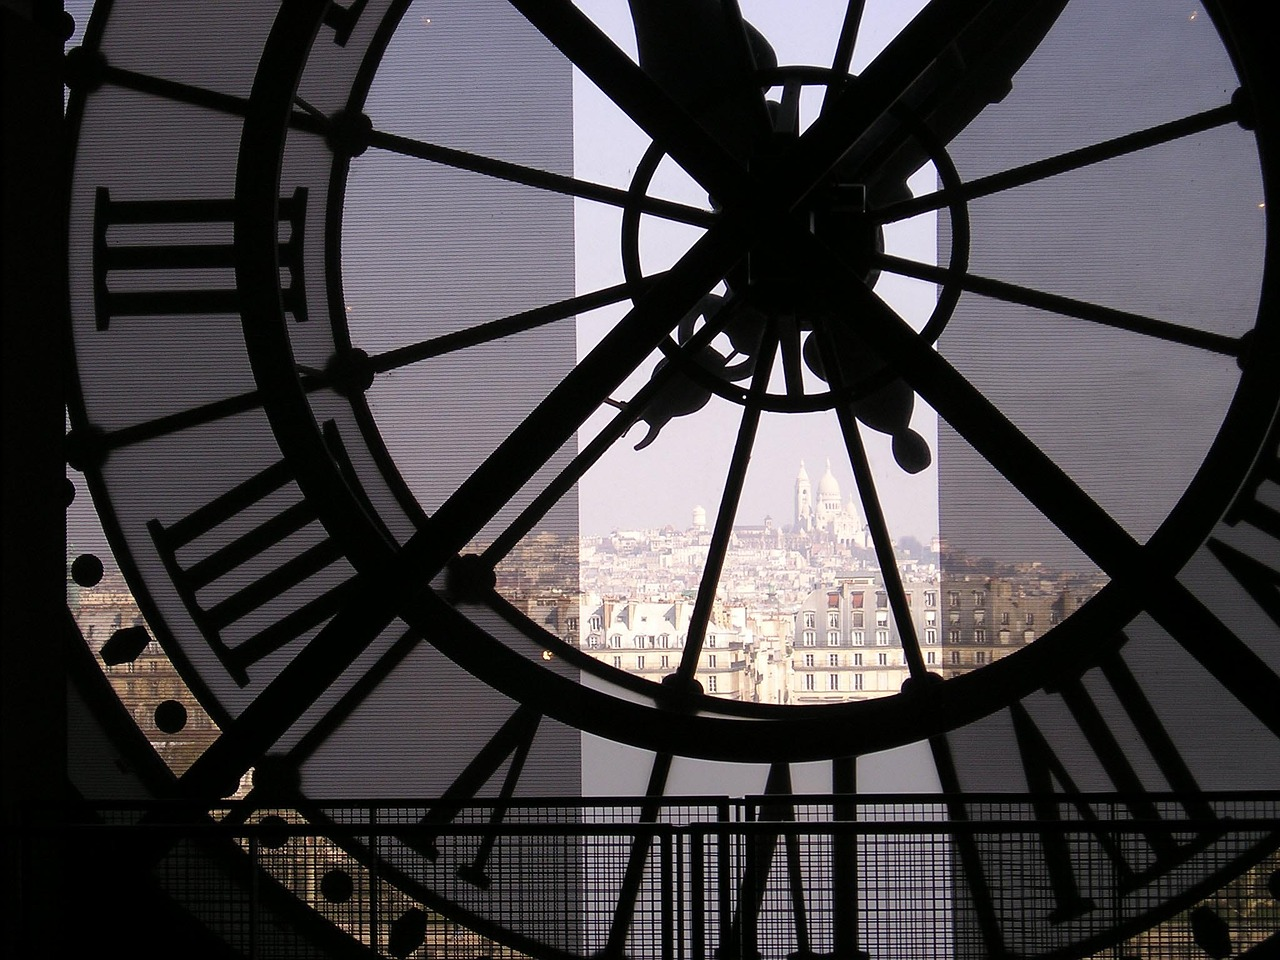 Grande horloge du Musée d'Orsay